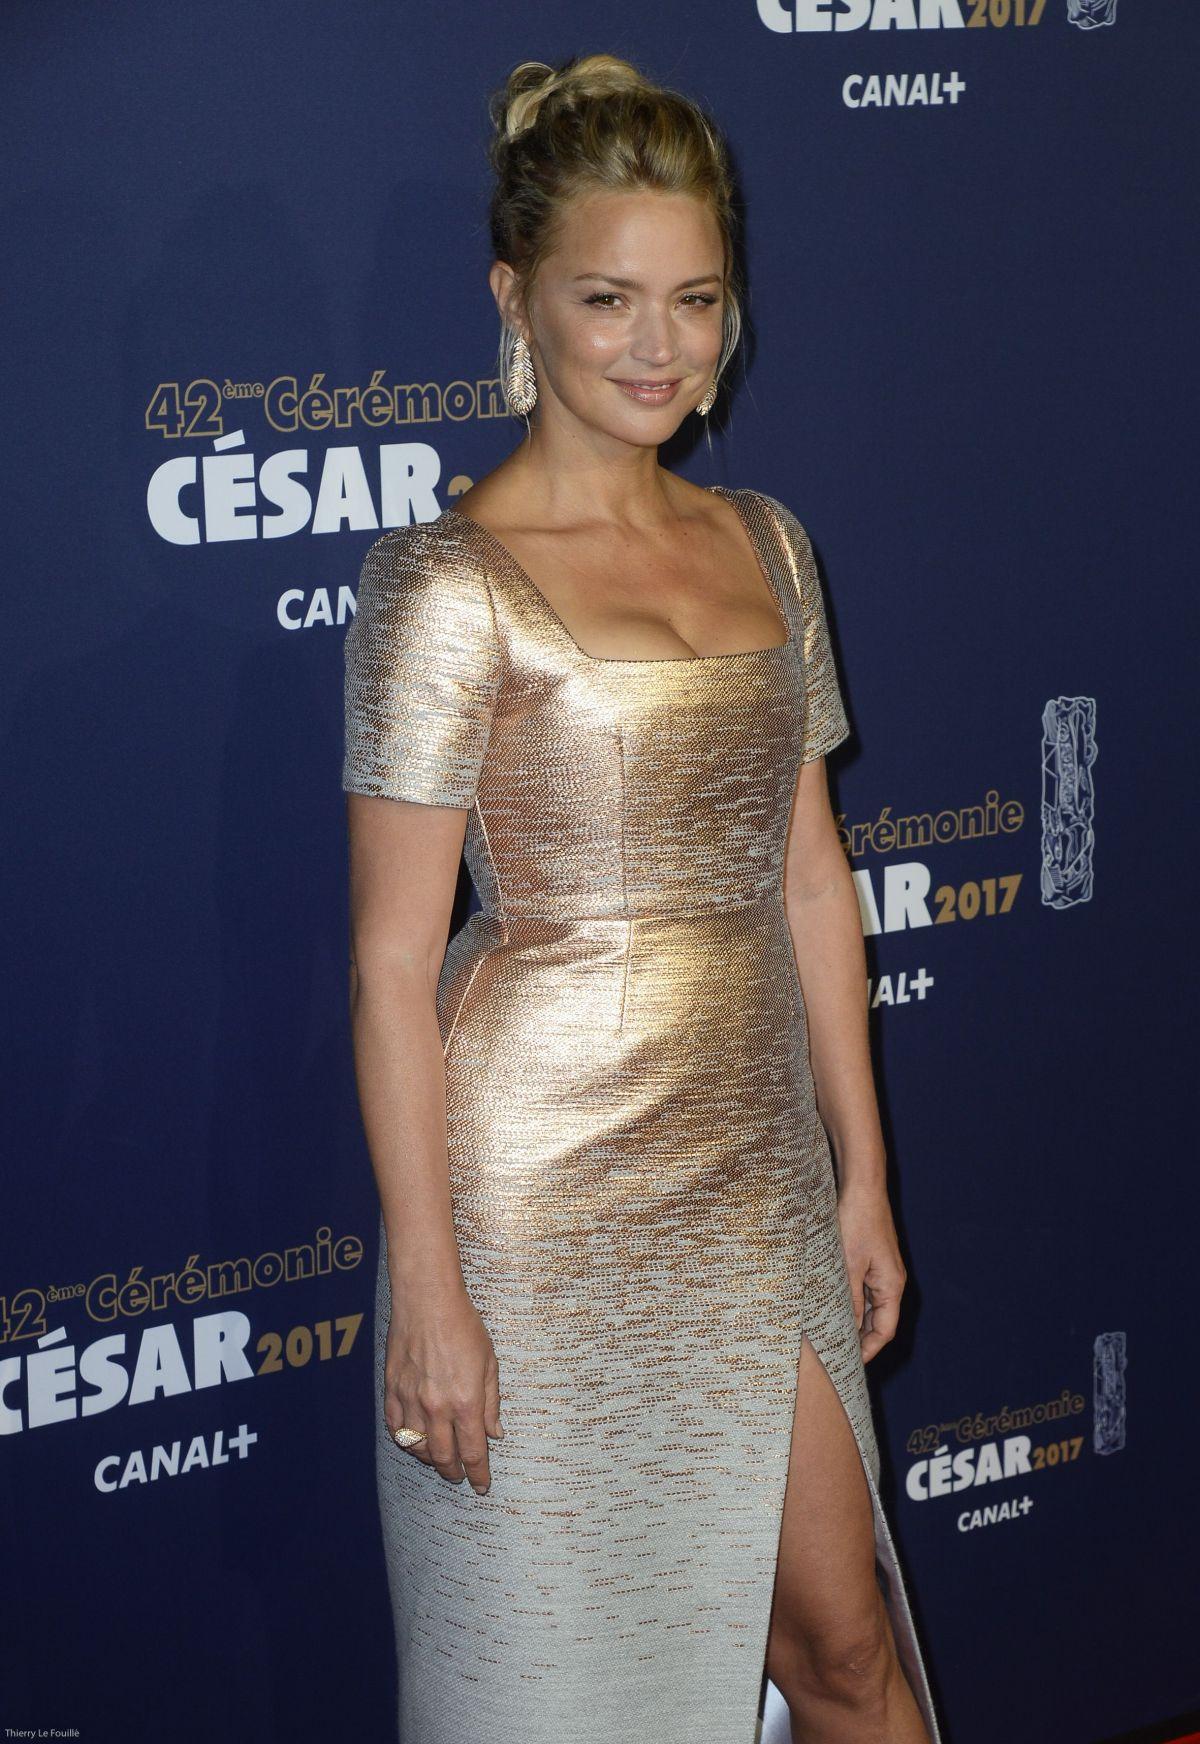 VIRGINIE EFIRA at Cesar Film Awards in Paris 02/24/2017